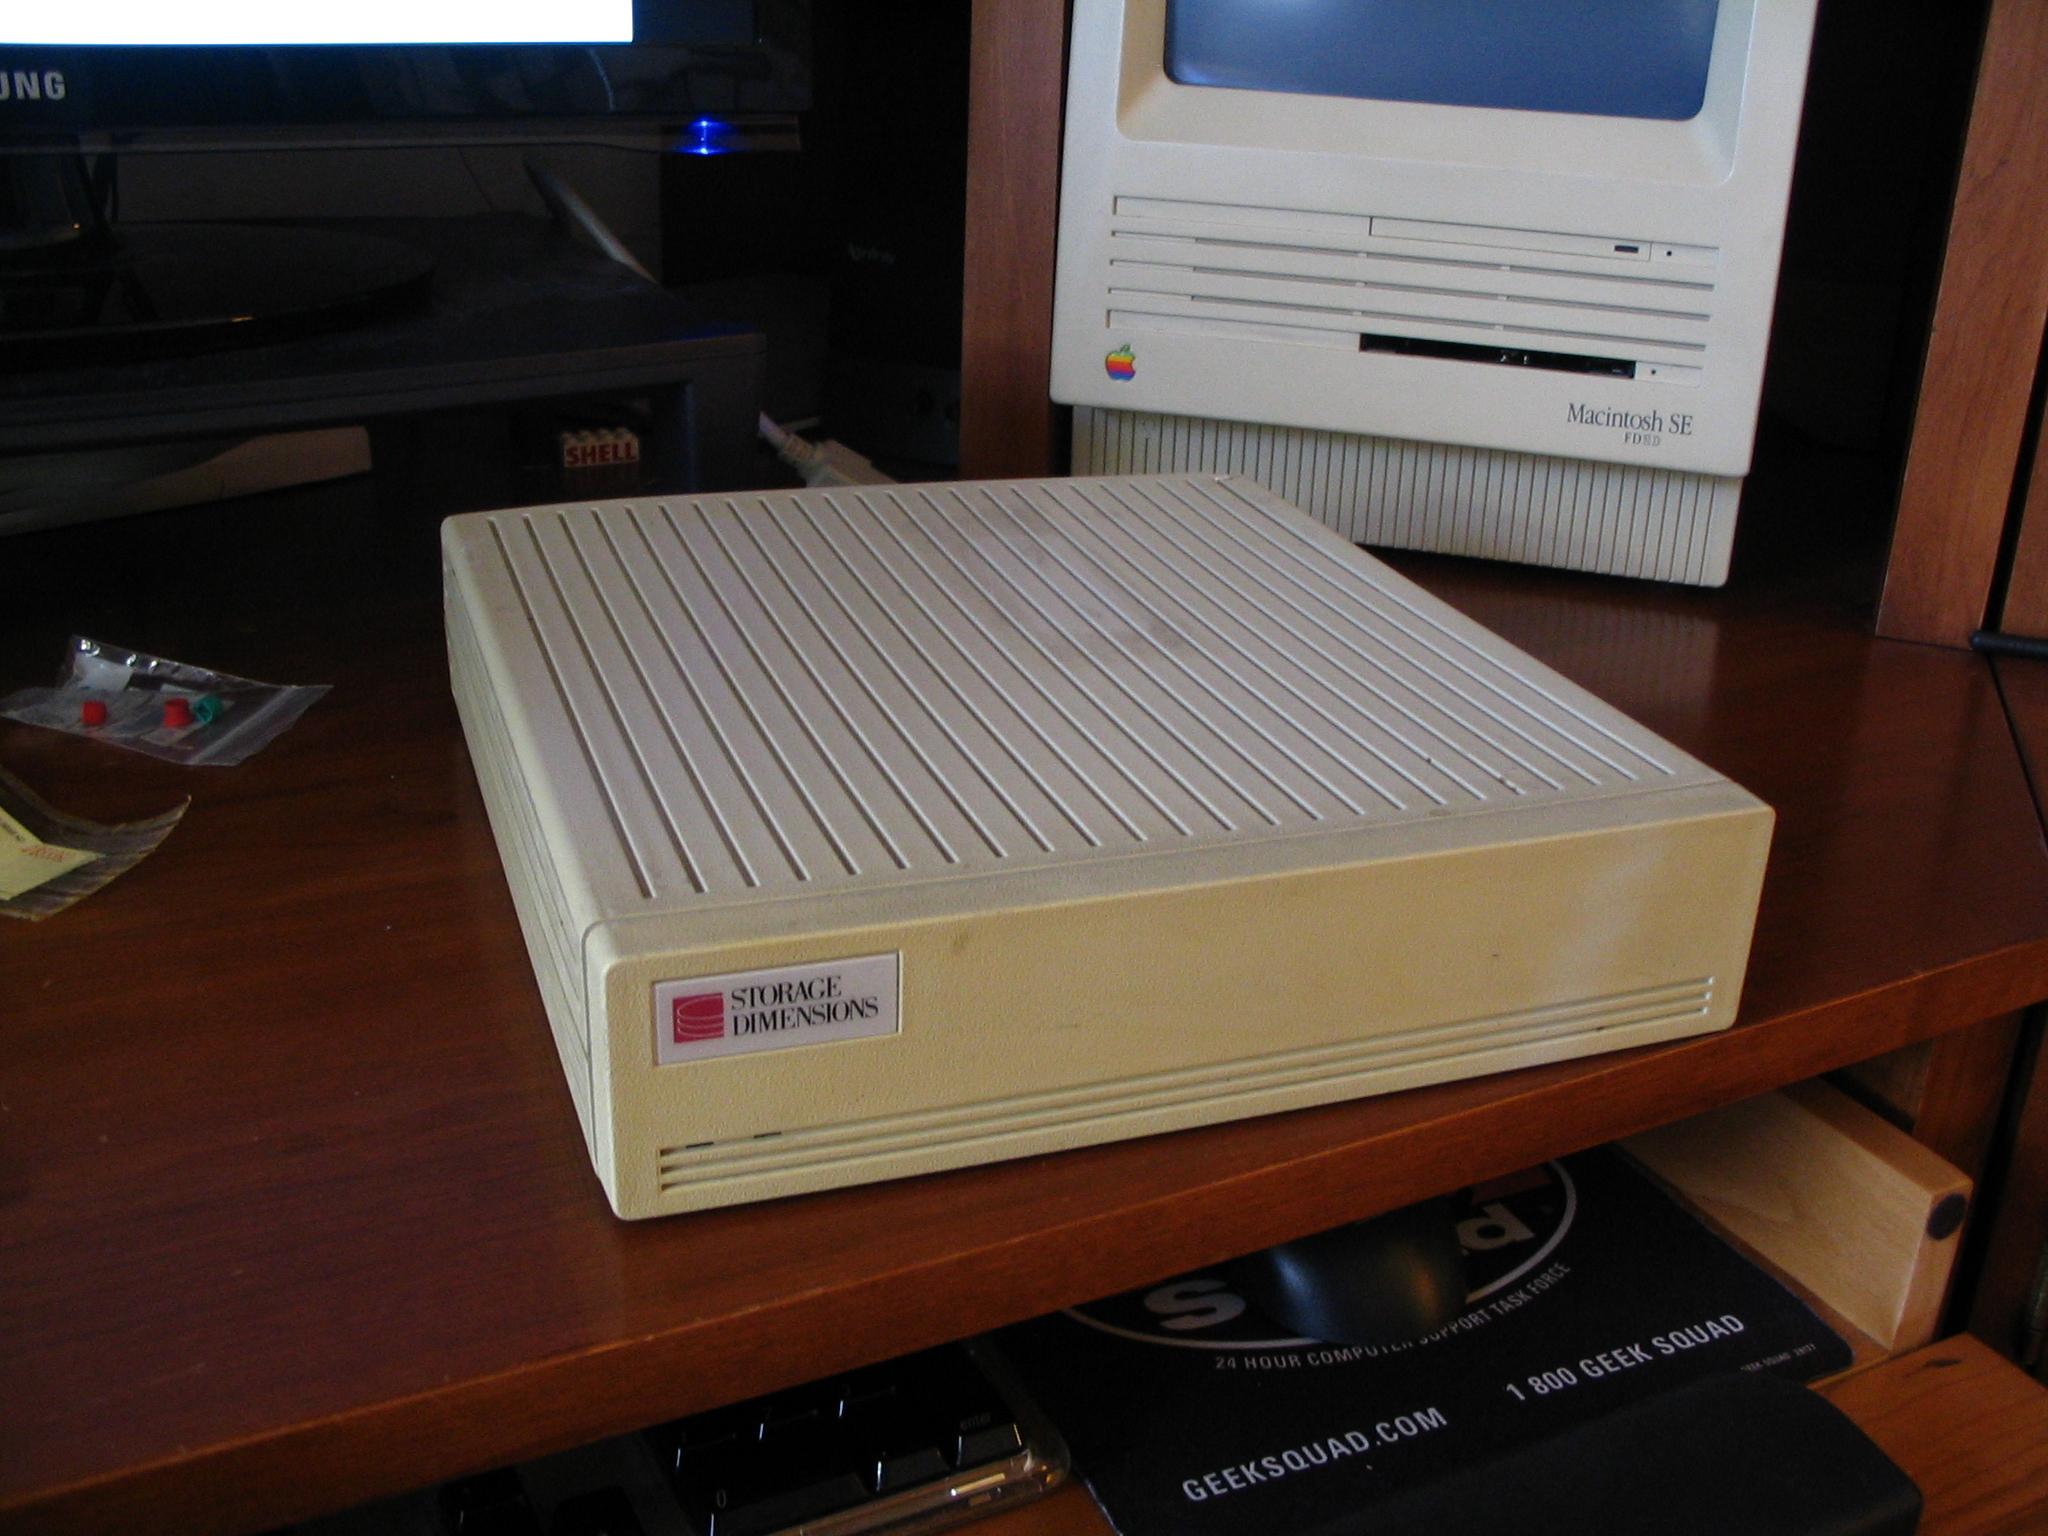 macintosh se hard drive